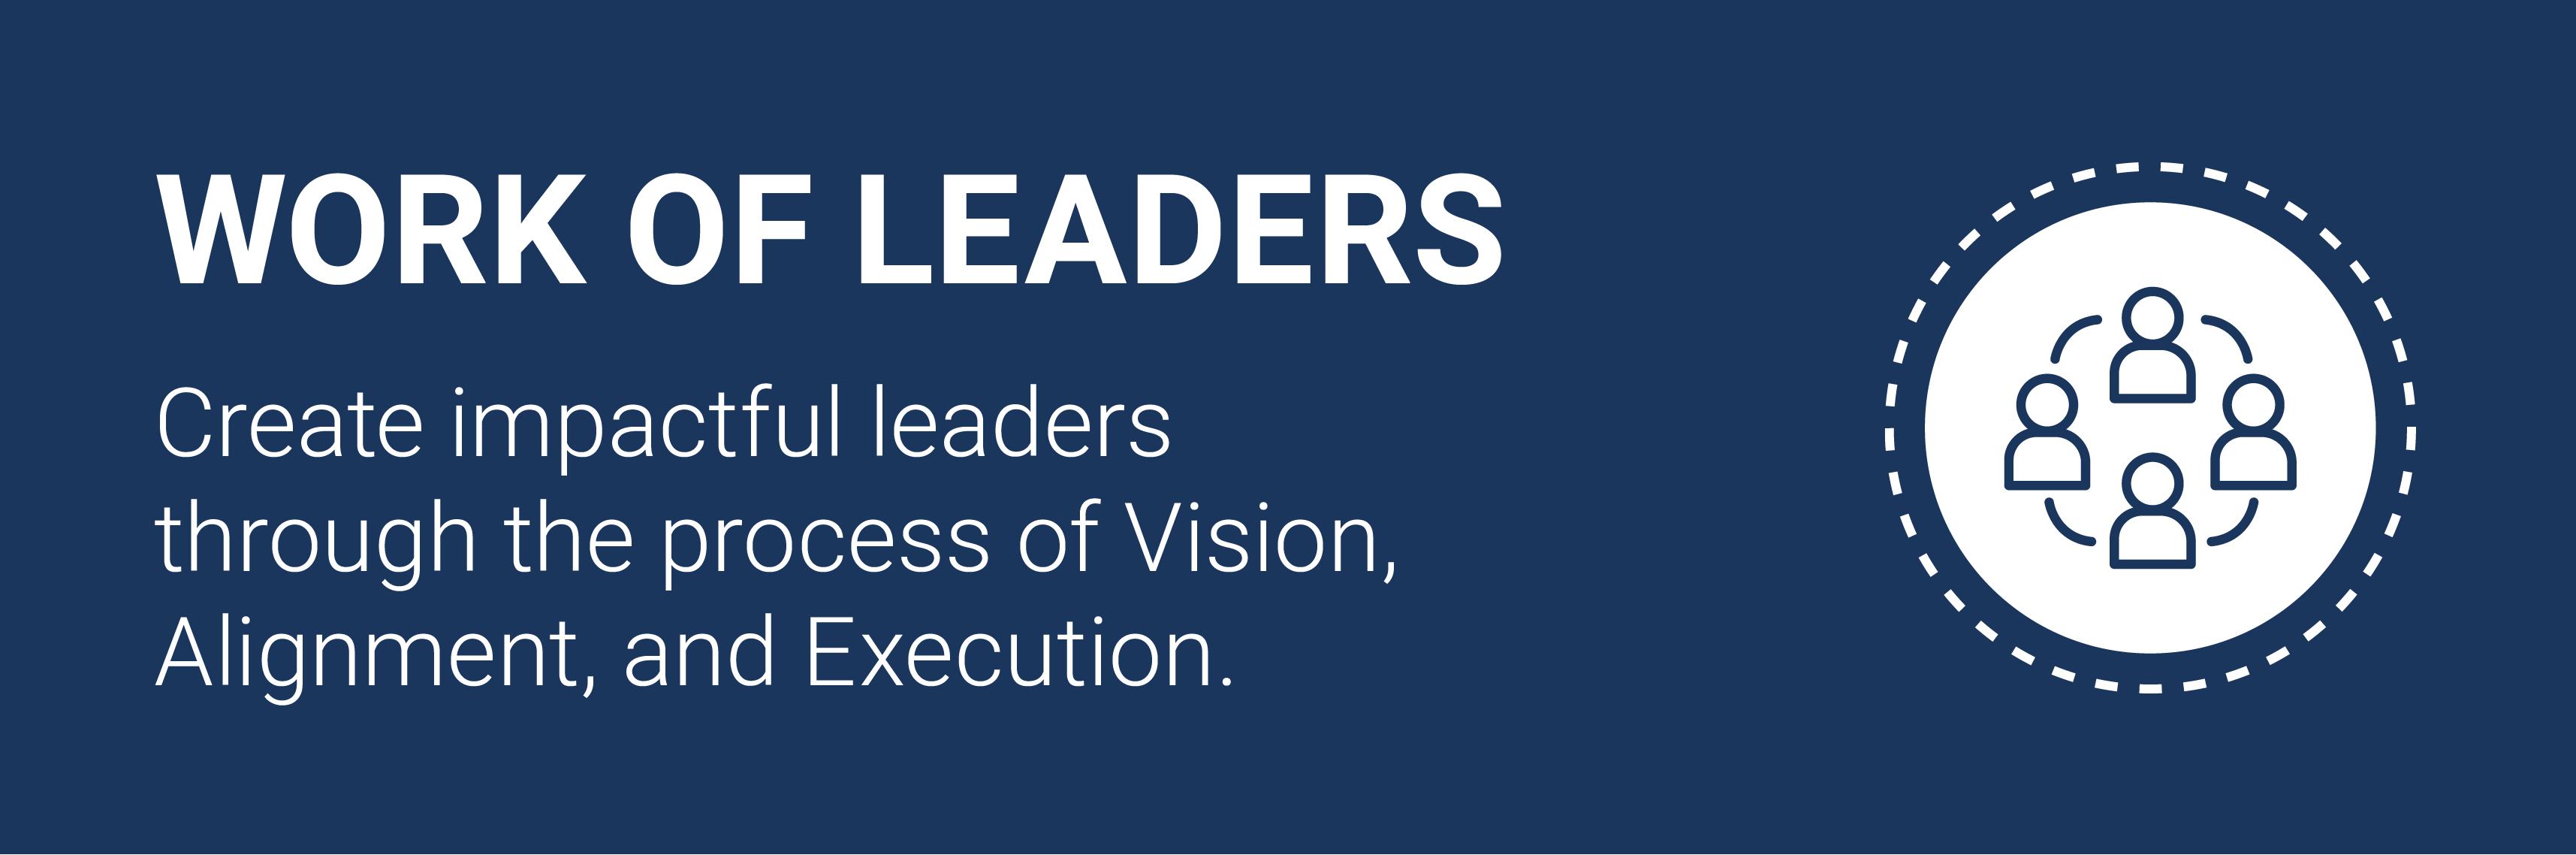 Everything DiSC Work of Leaders Program.